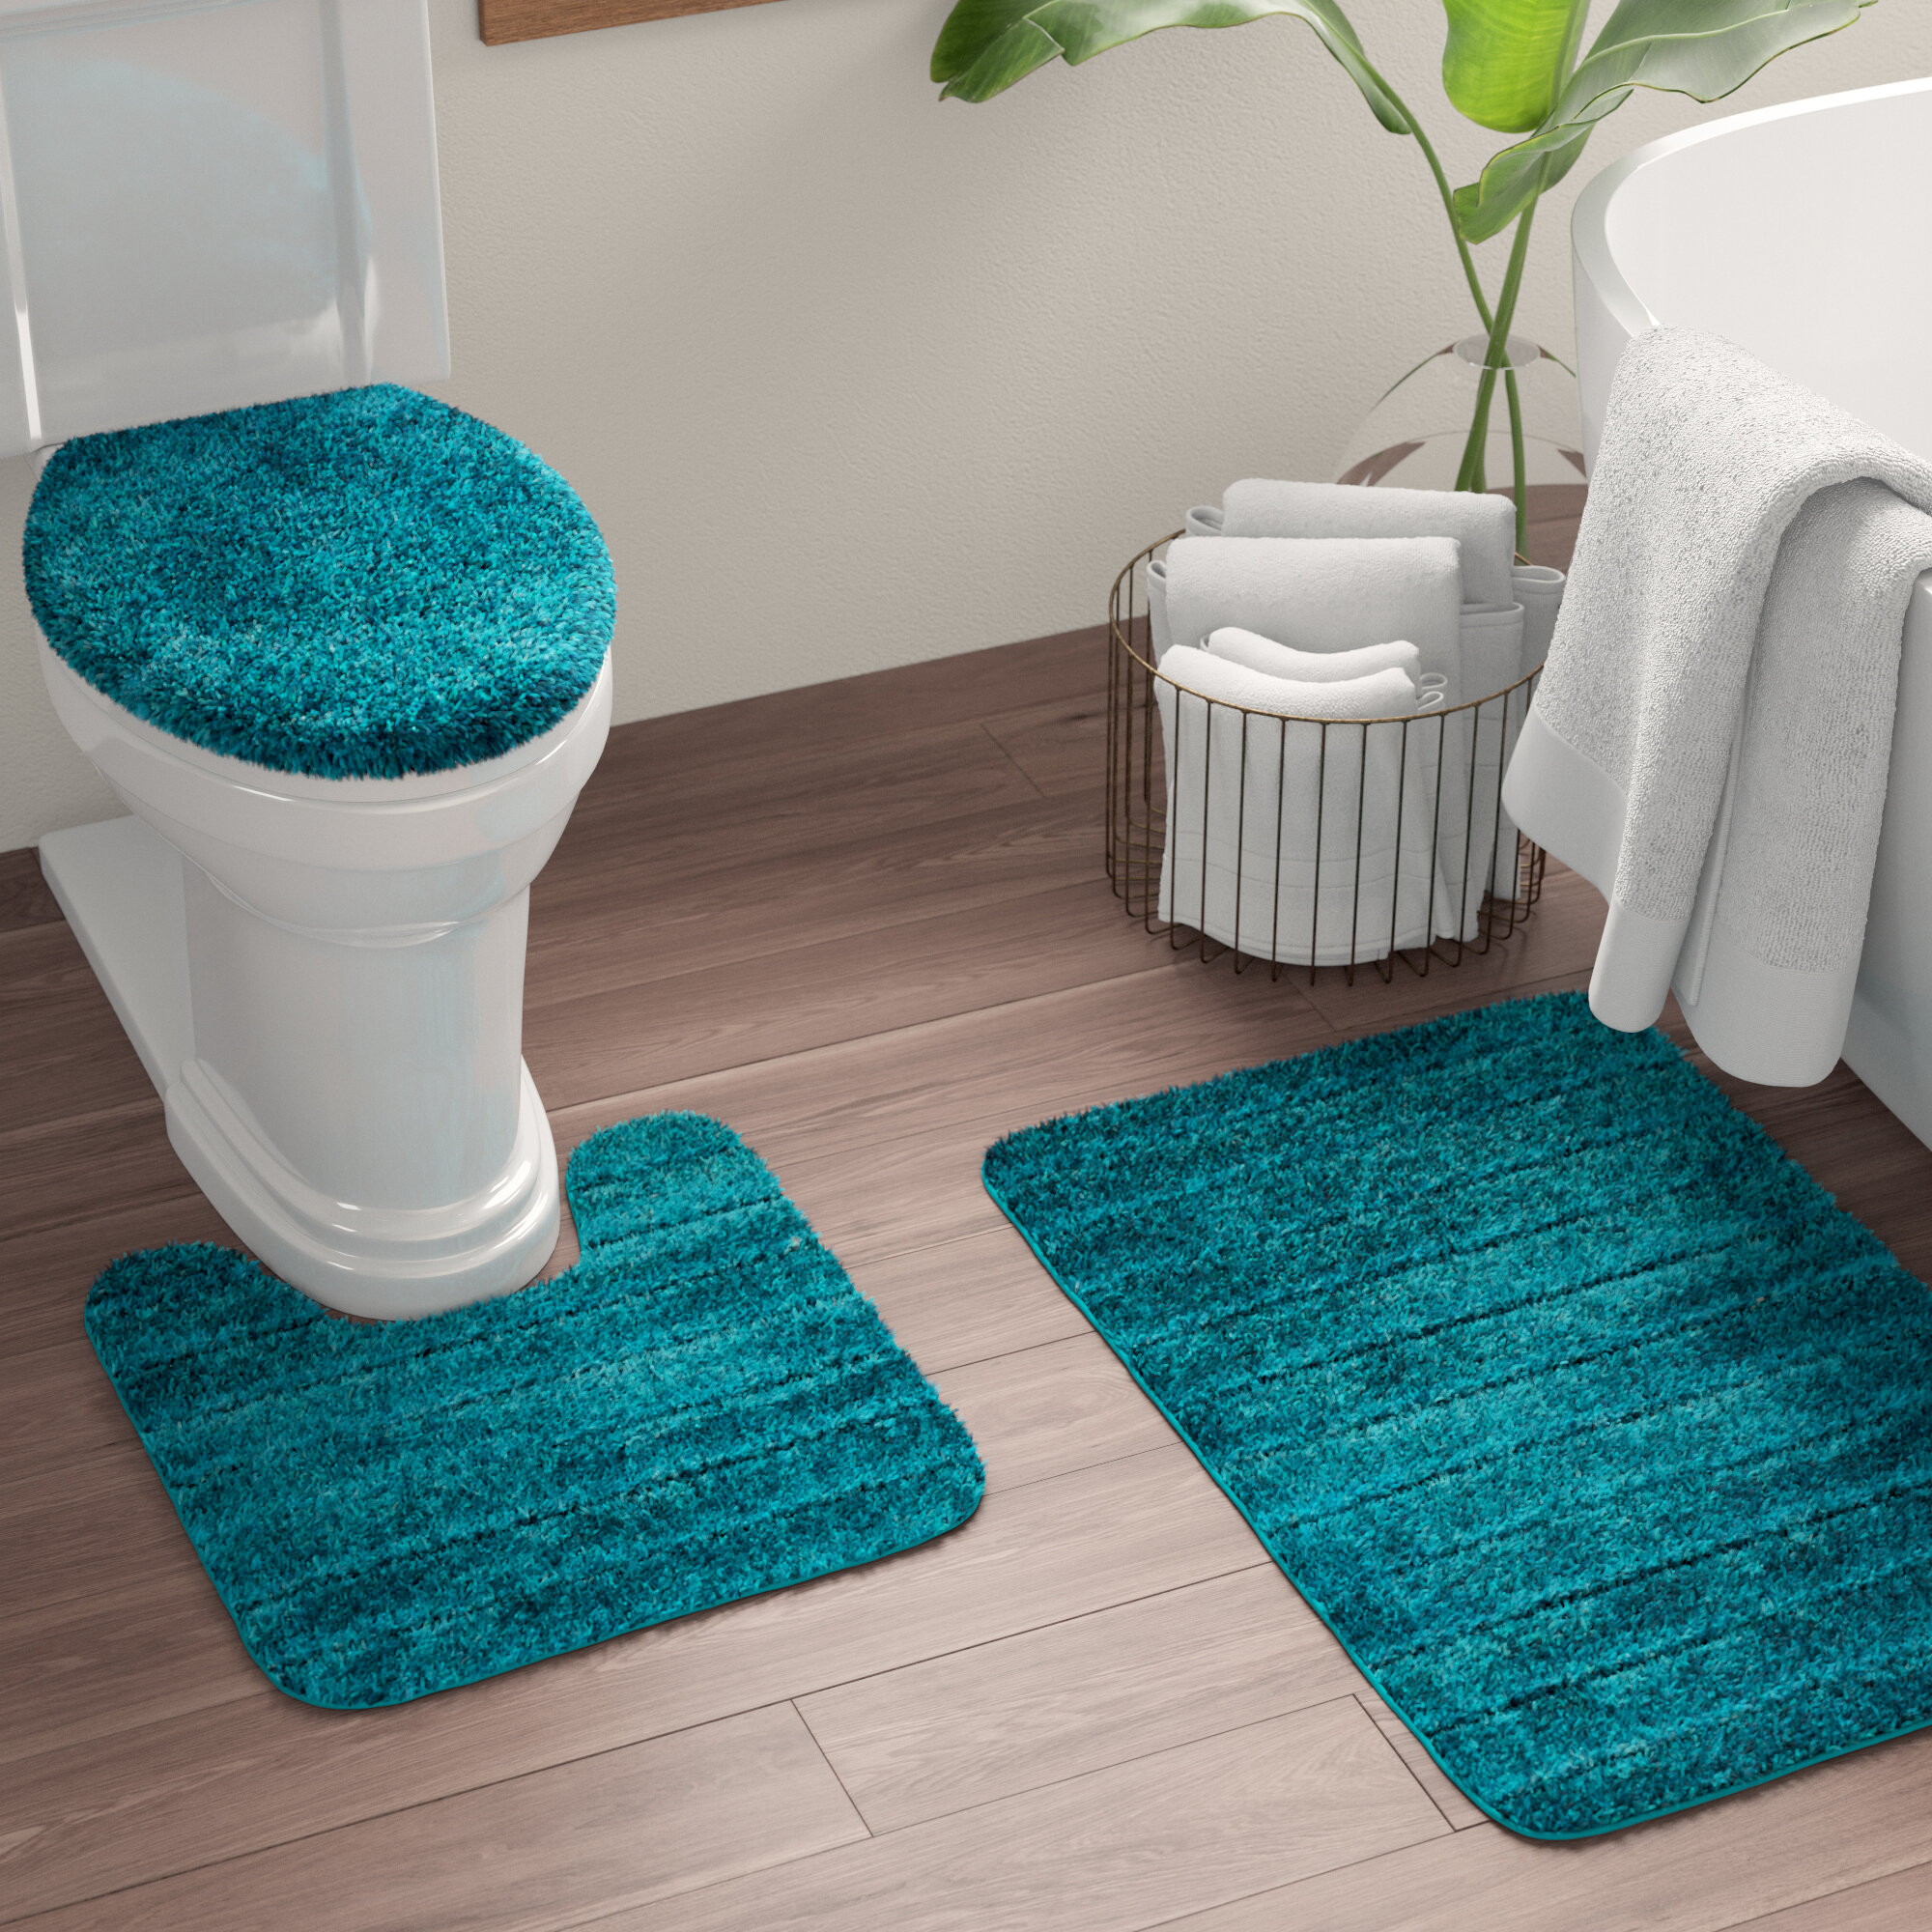 Ocean World U Shaped Toilet Mat with Toilet Lid Cover Home Decor Bathroom Bathroom Mat Sets 3 Pieces